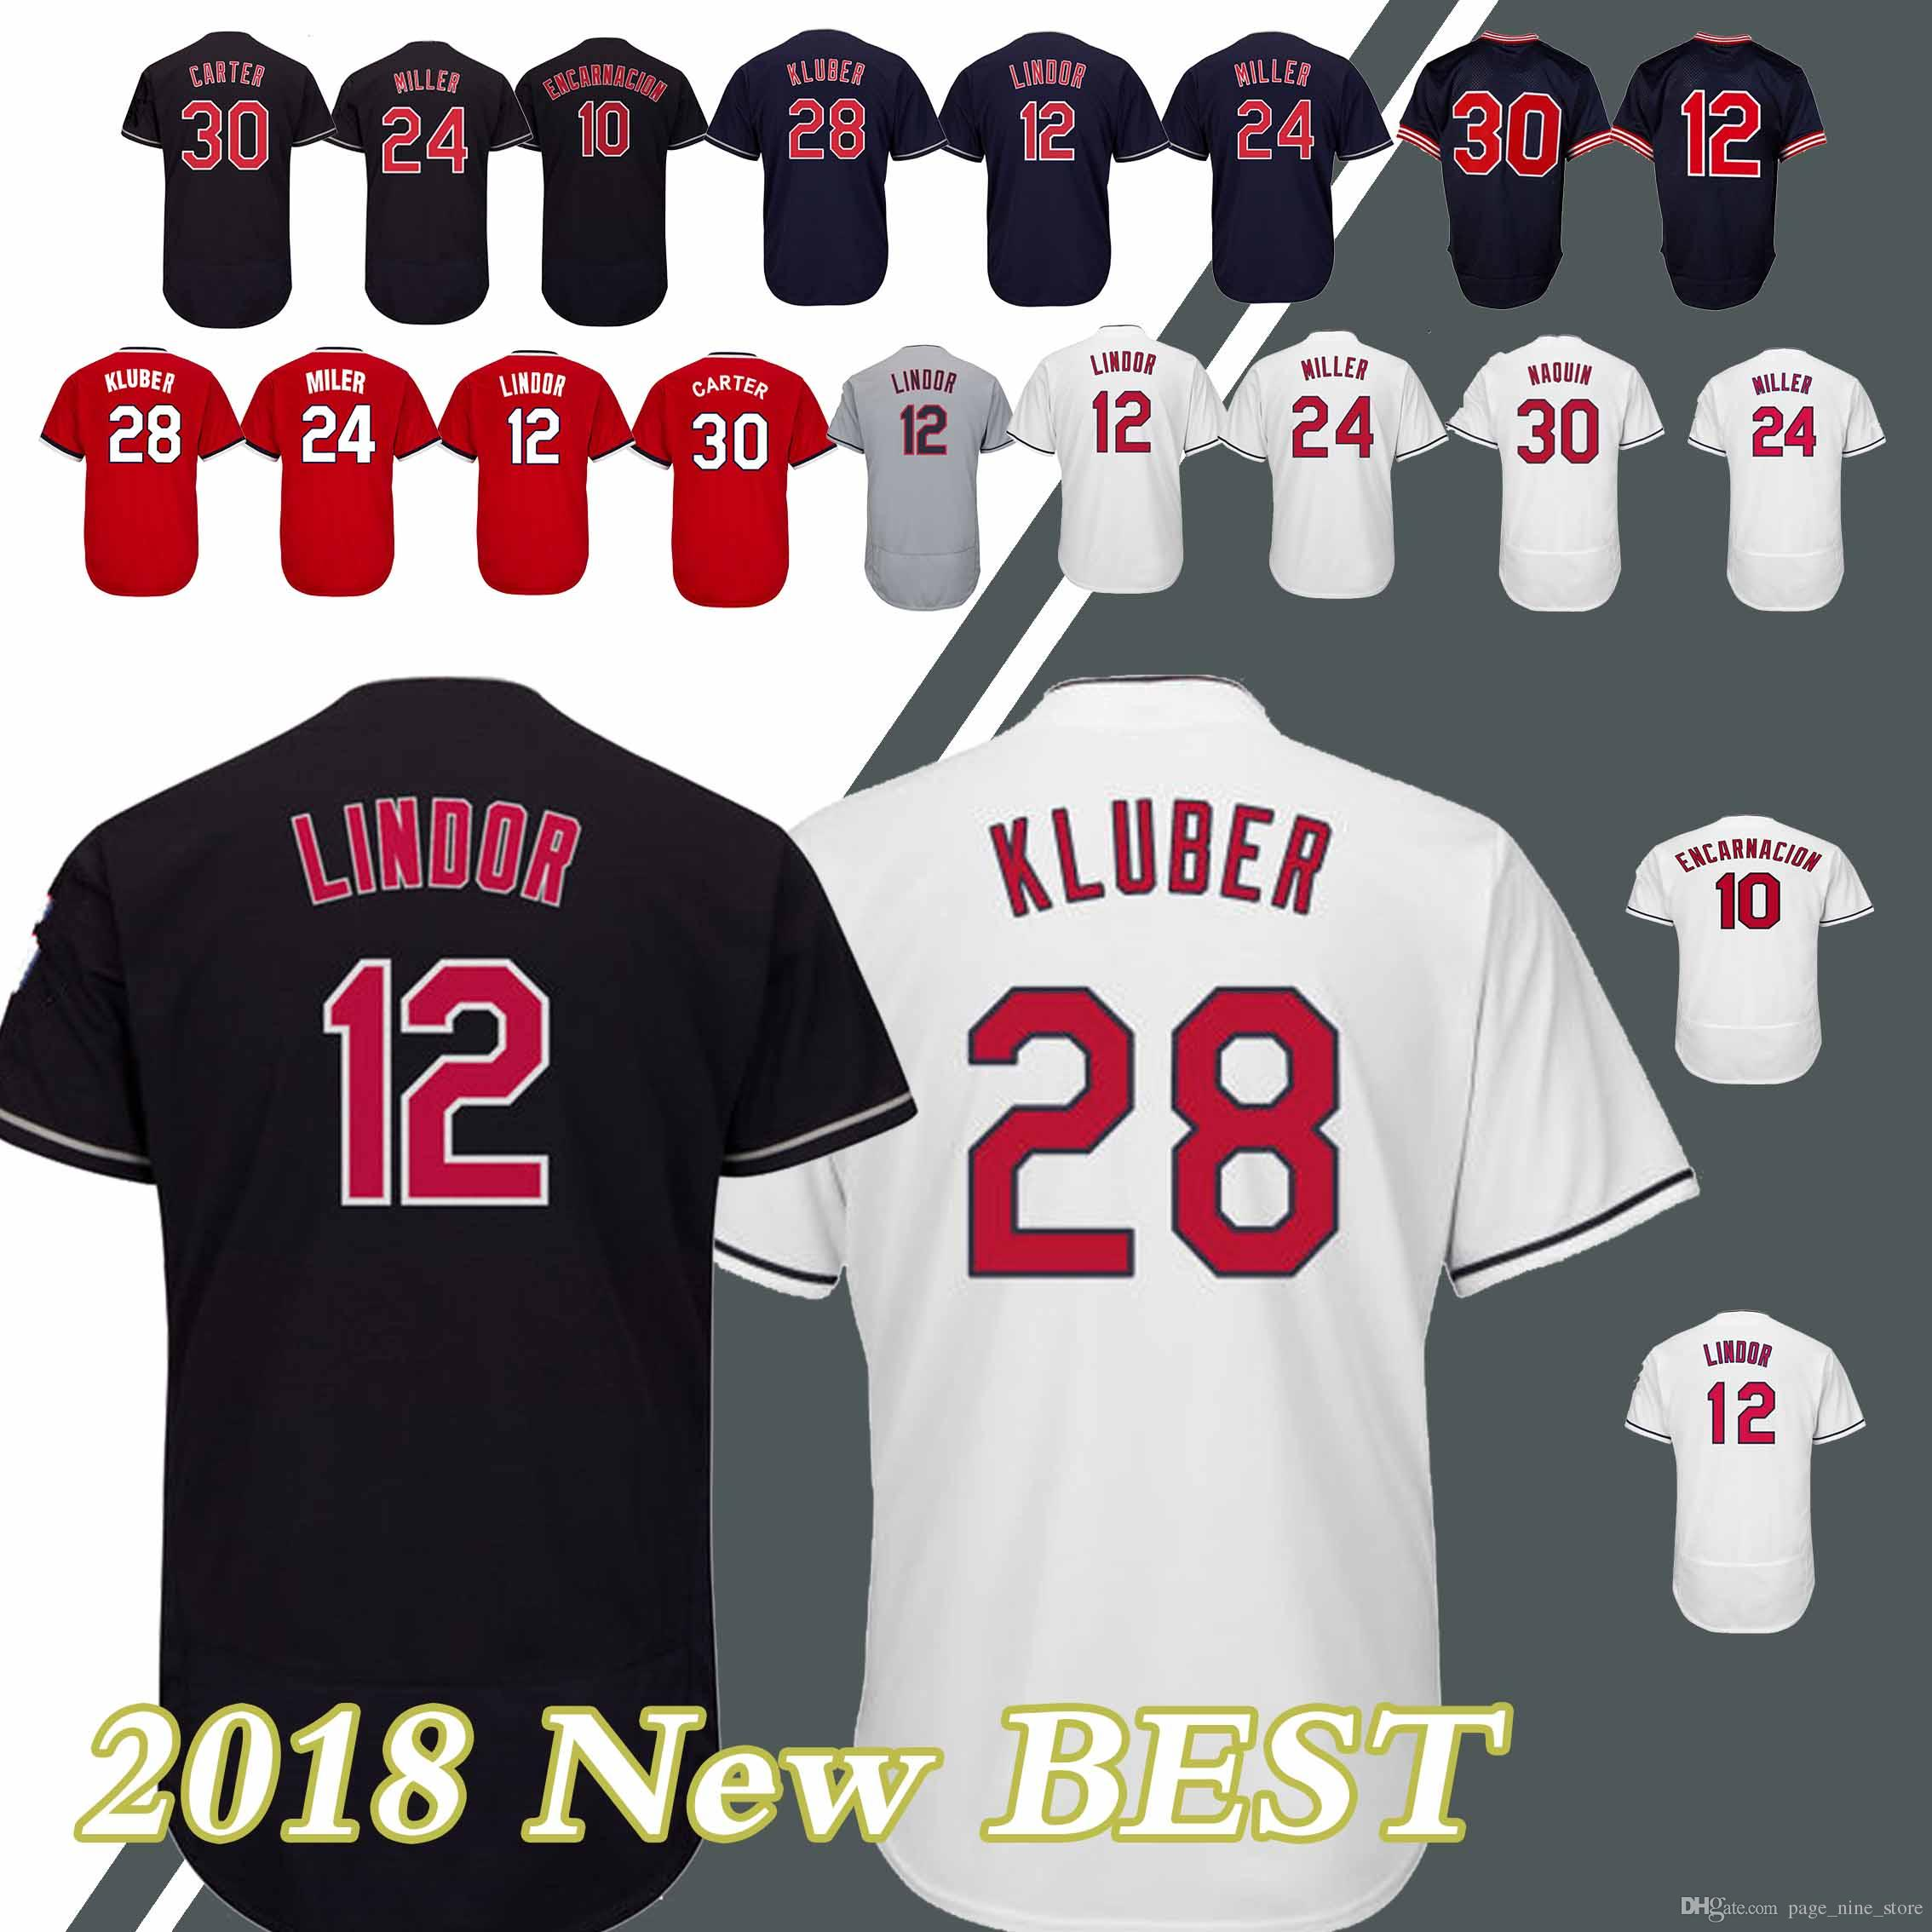 brand new abf78 c7c7c Cleveland indians jerseys 10 Edwin Encarnacion 30 Joe Carter Hot sale  high-quality 2018 new Jersey sportswear